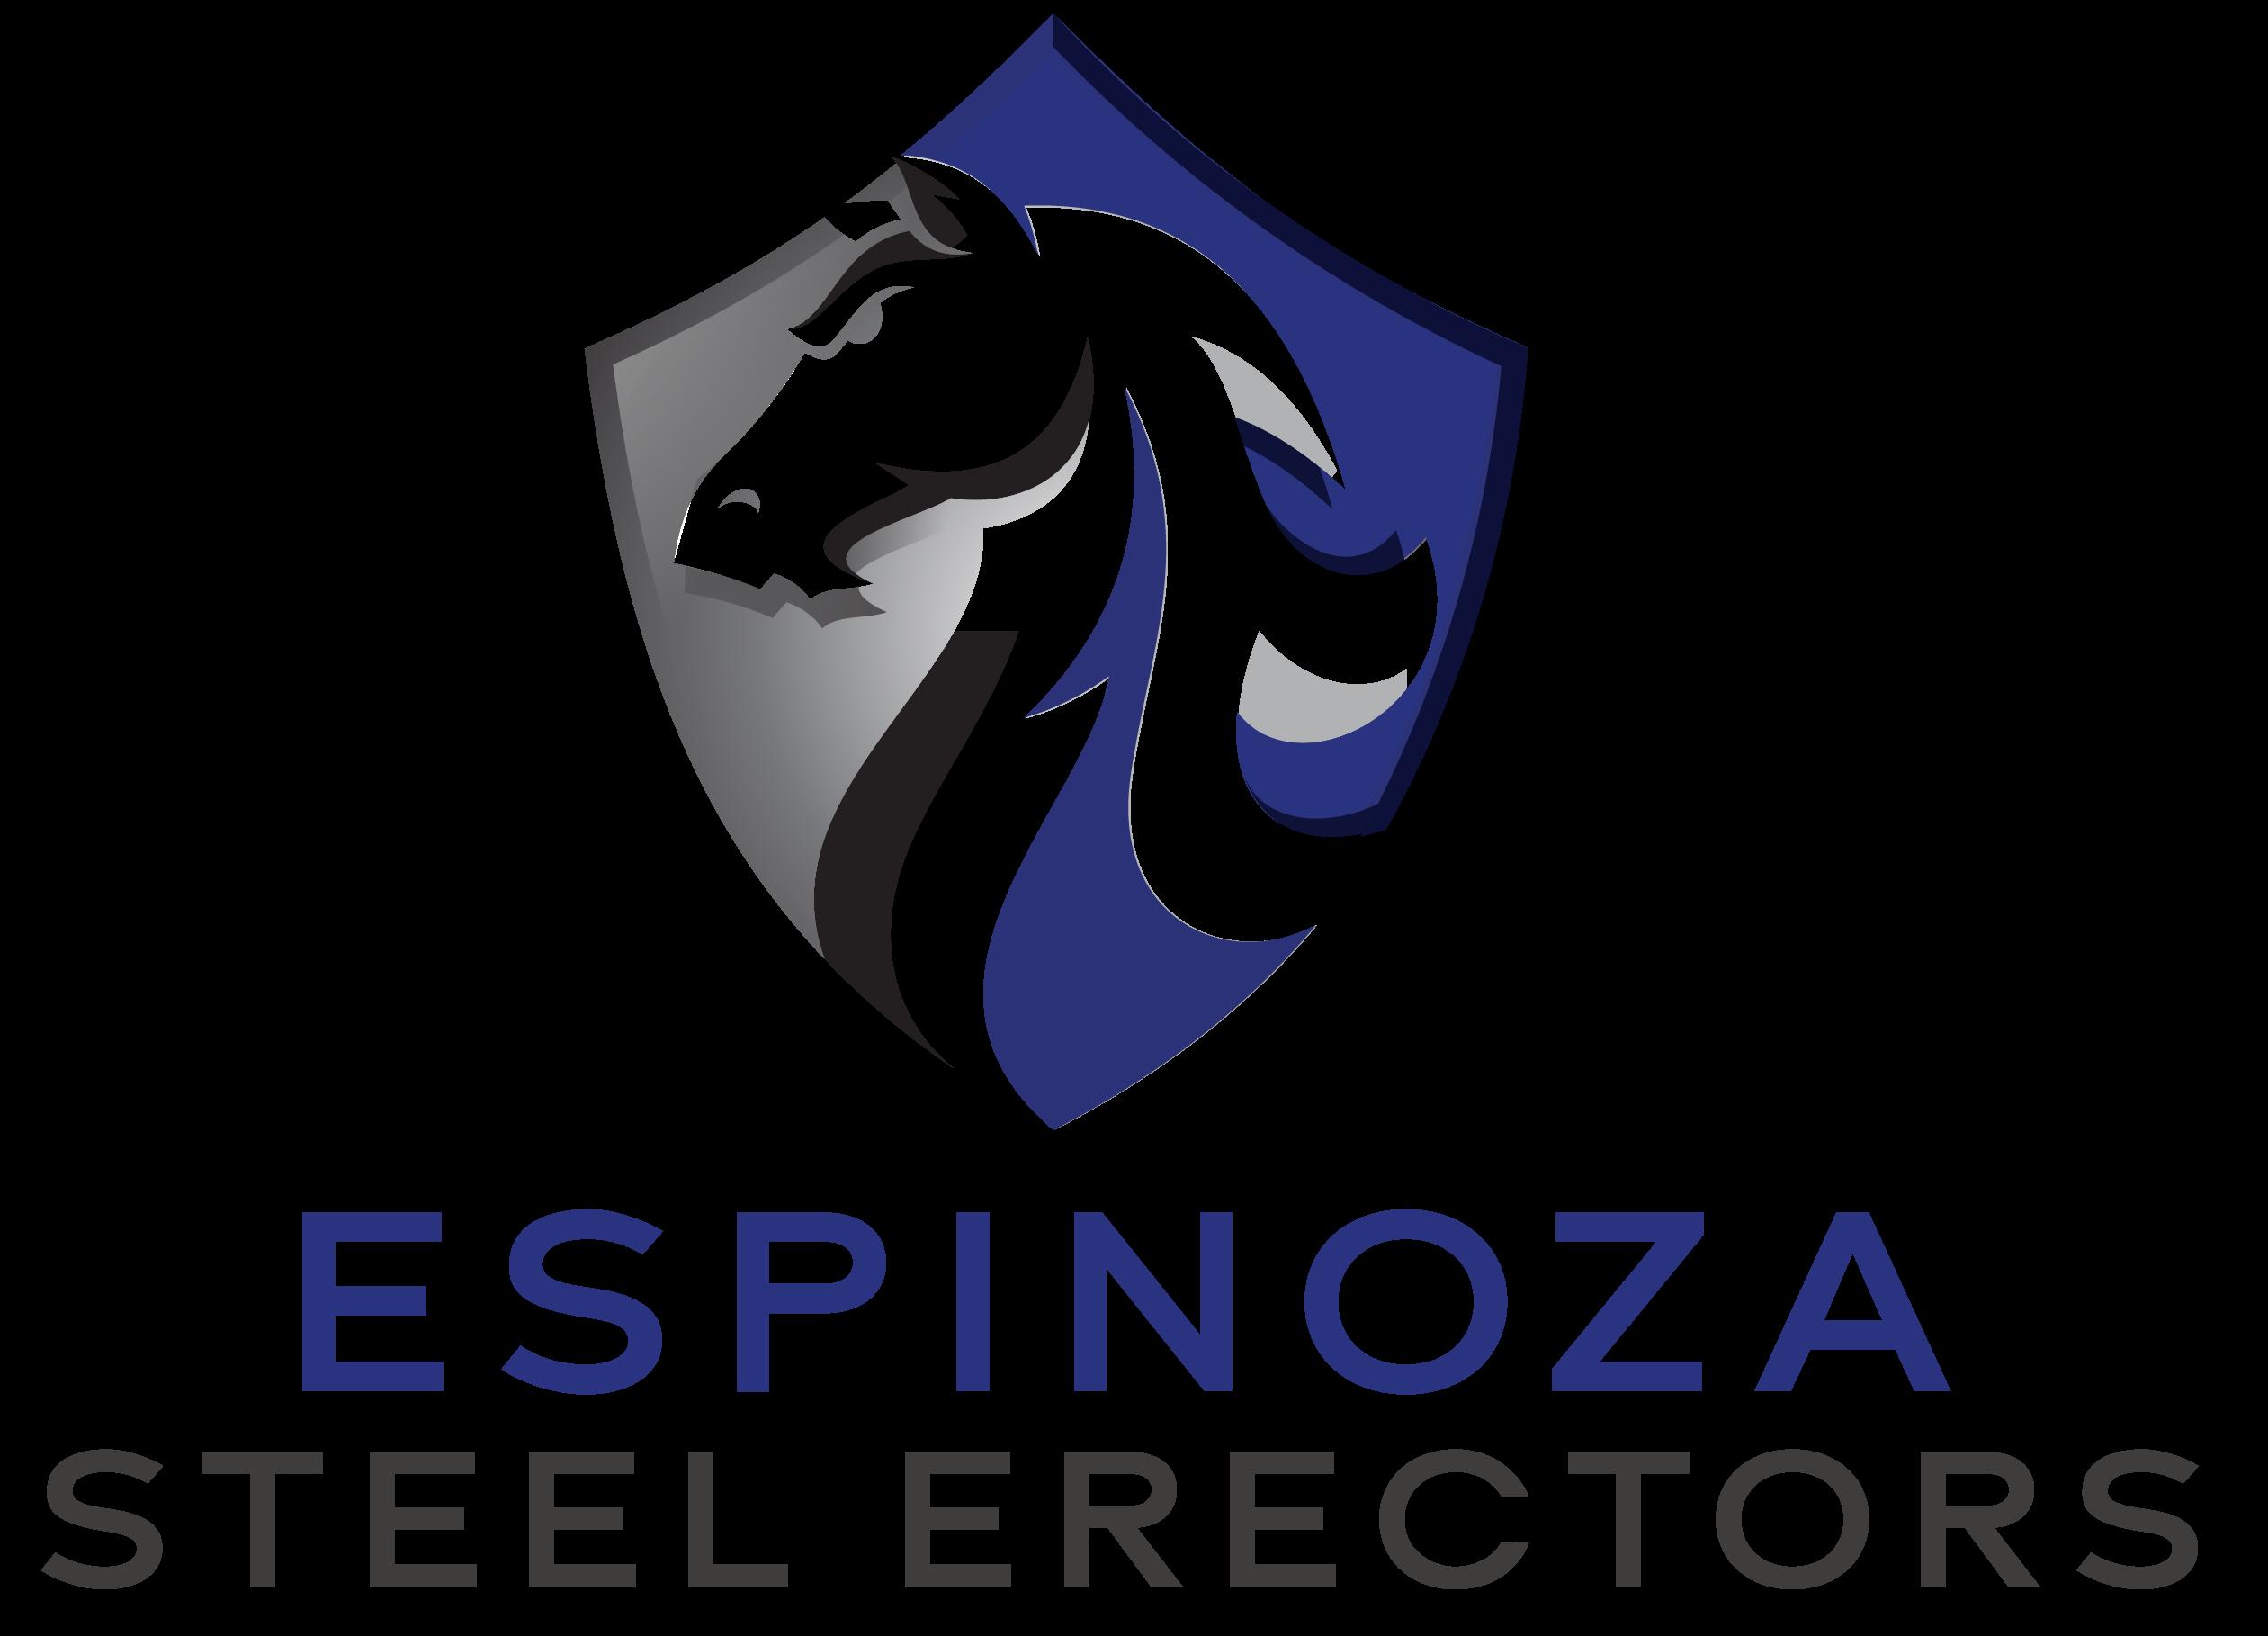 Plasma Cutting Designs | Steel Services in Dallas Tx. | General Welding